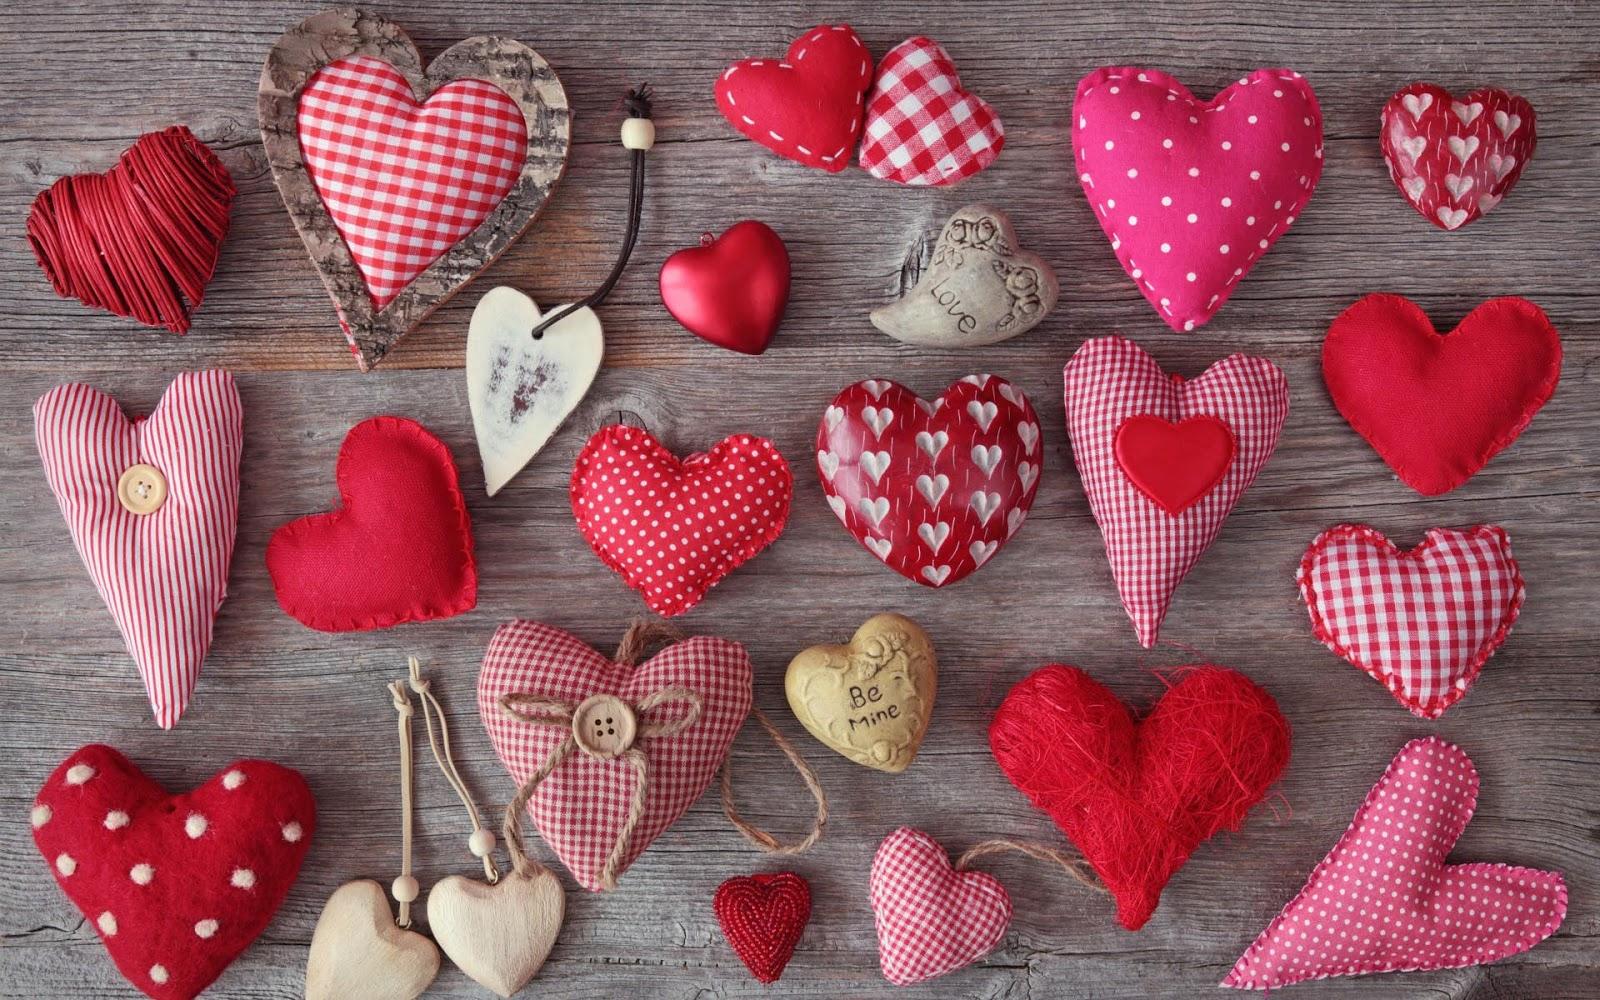 Картинки сердечки своими руками